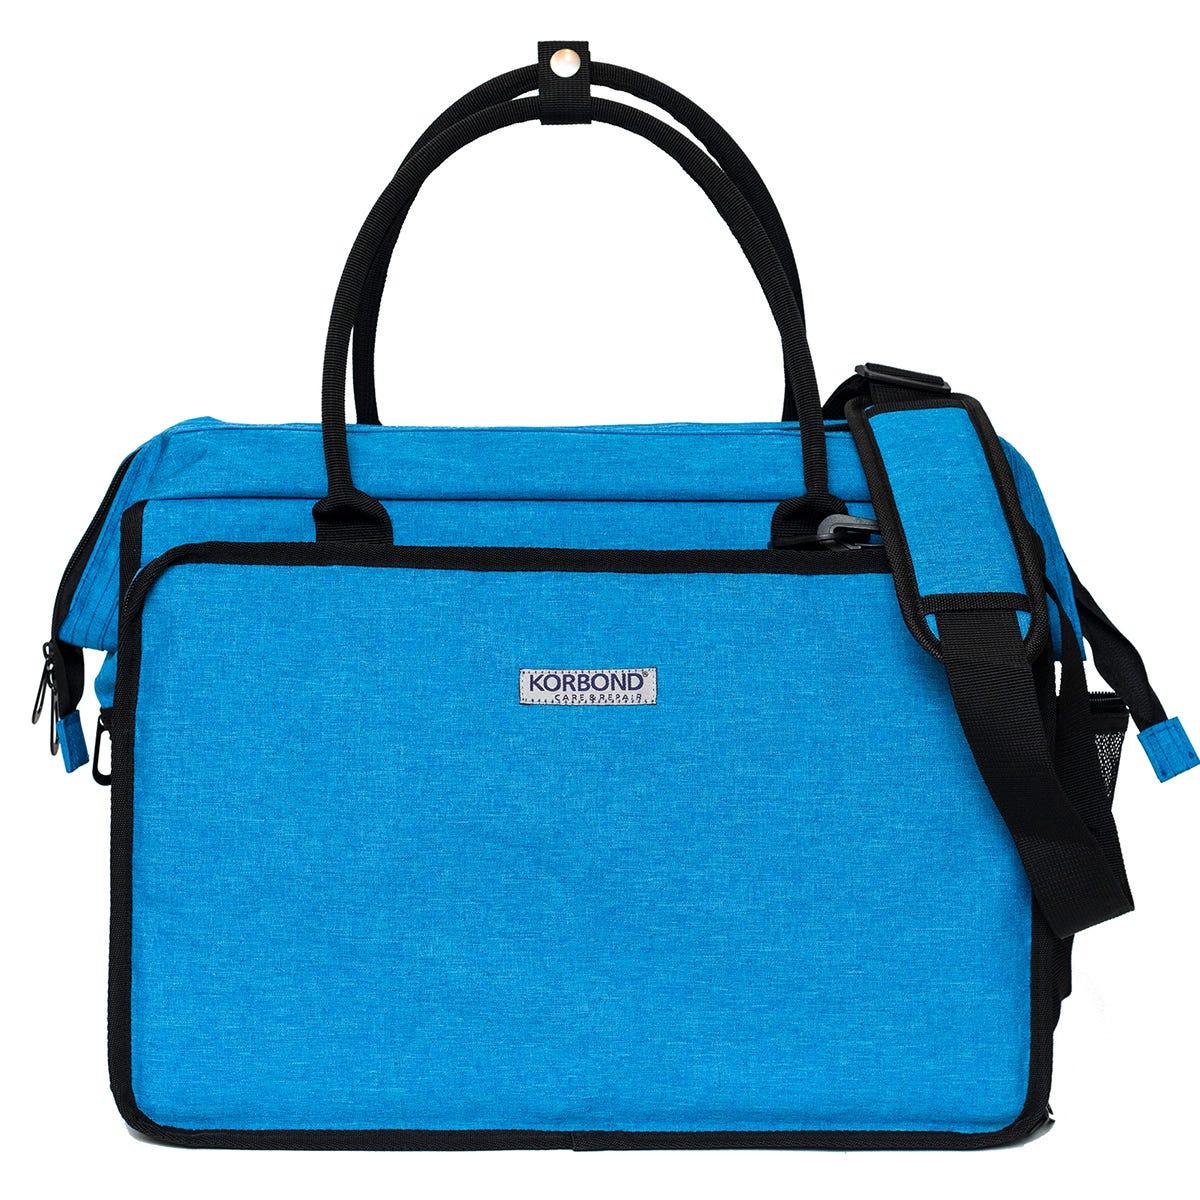 Korbond Blue Sewing Machine Bag